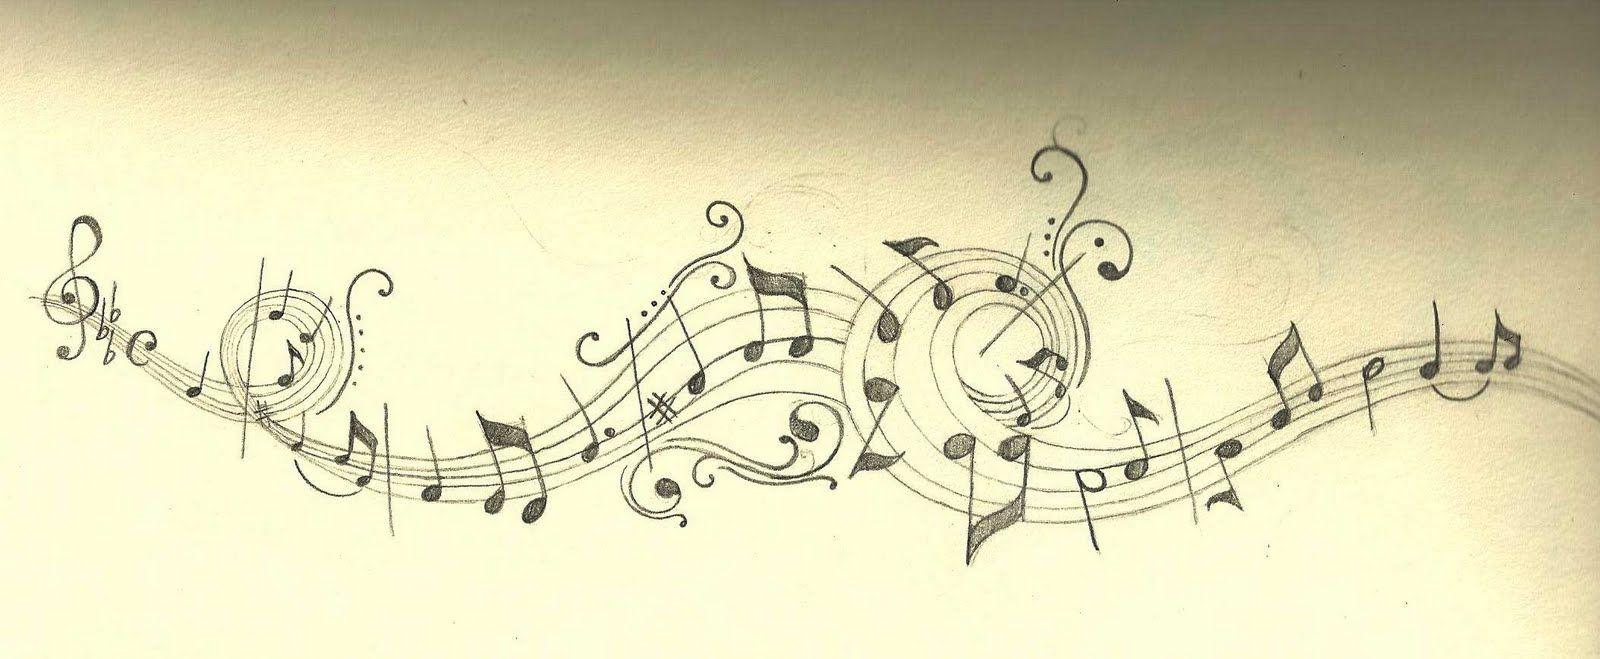 minnon: Cinta\'s Music Notes | tattoos | Pinterest | Music notes ...